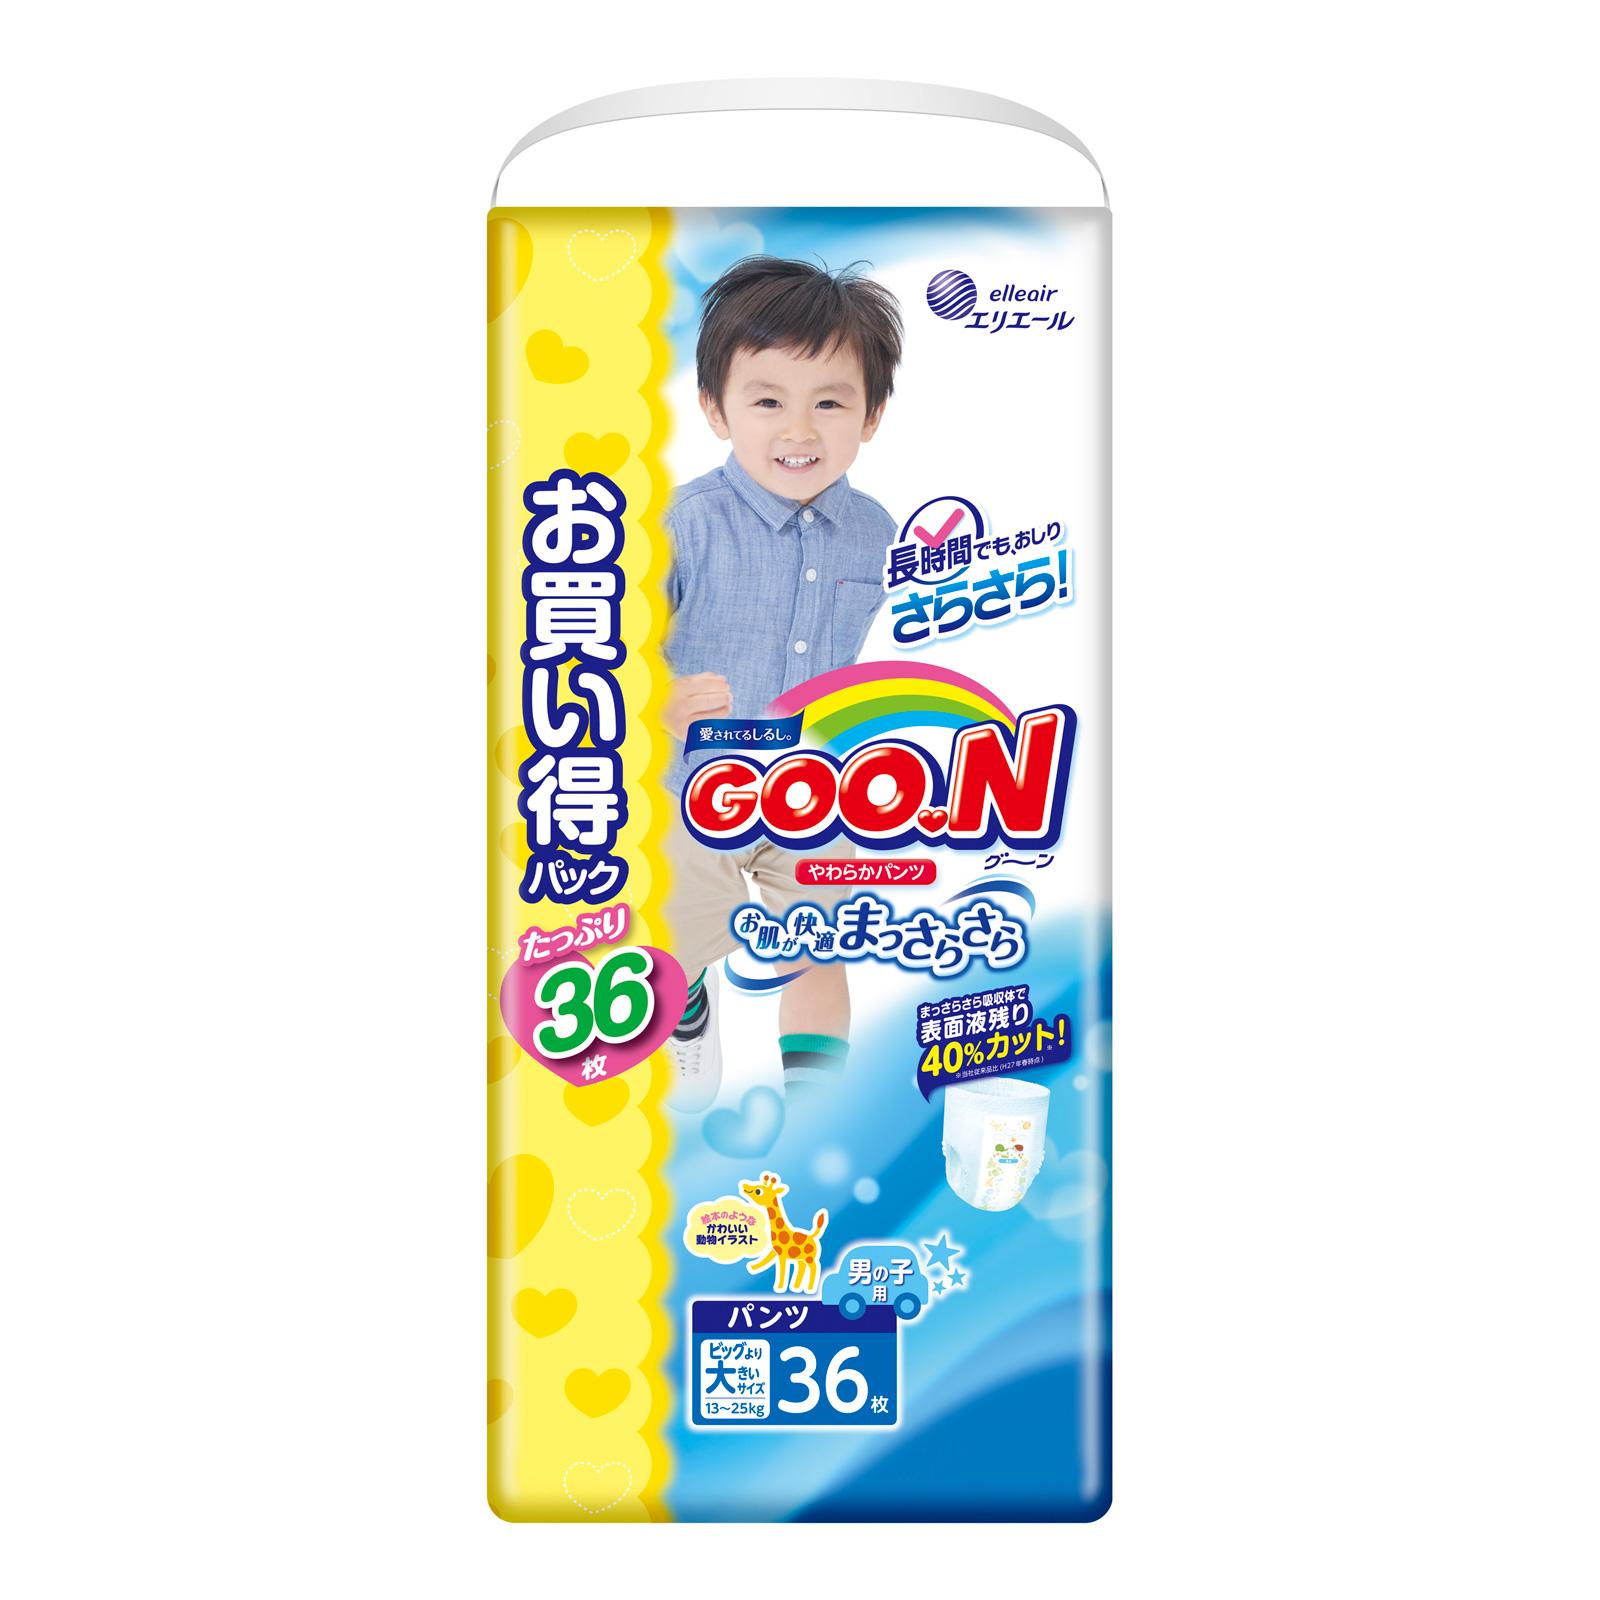 Трусики Goon для мальчиков 13-25 кг (36 шт) Размер XXL<br>